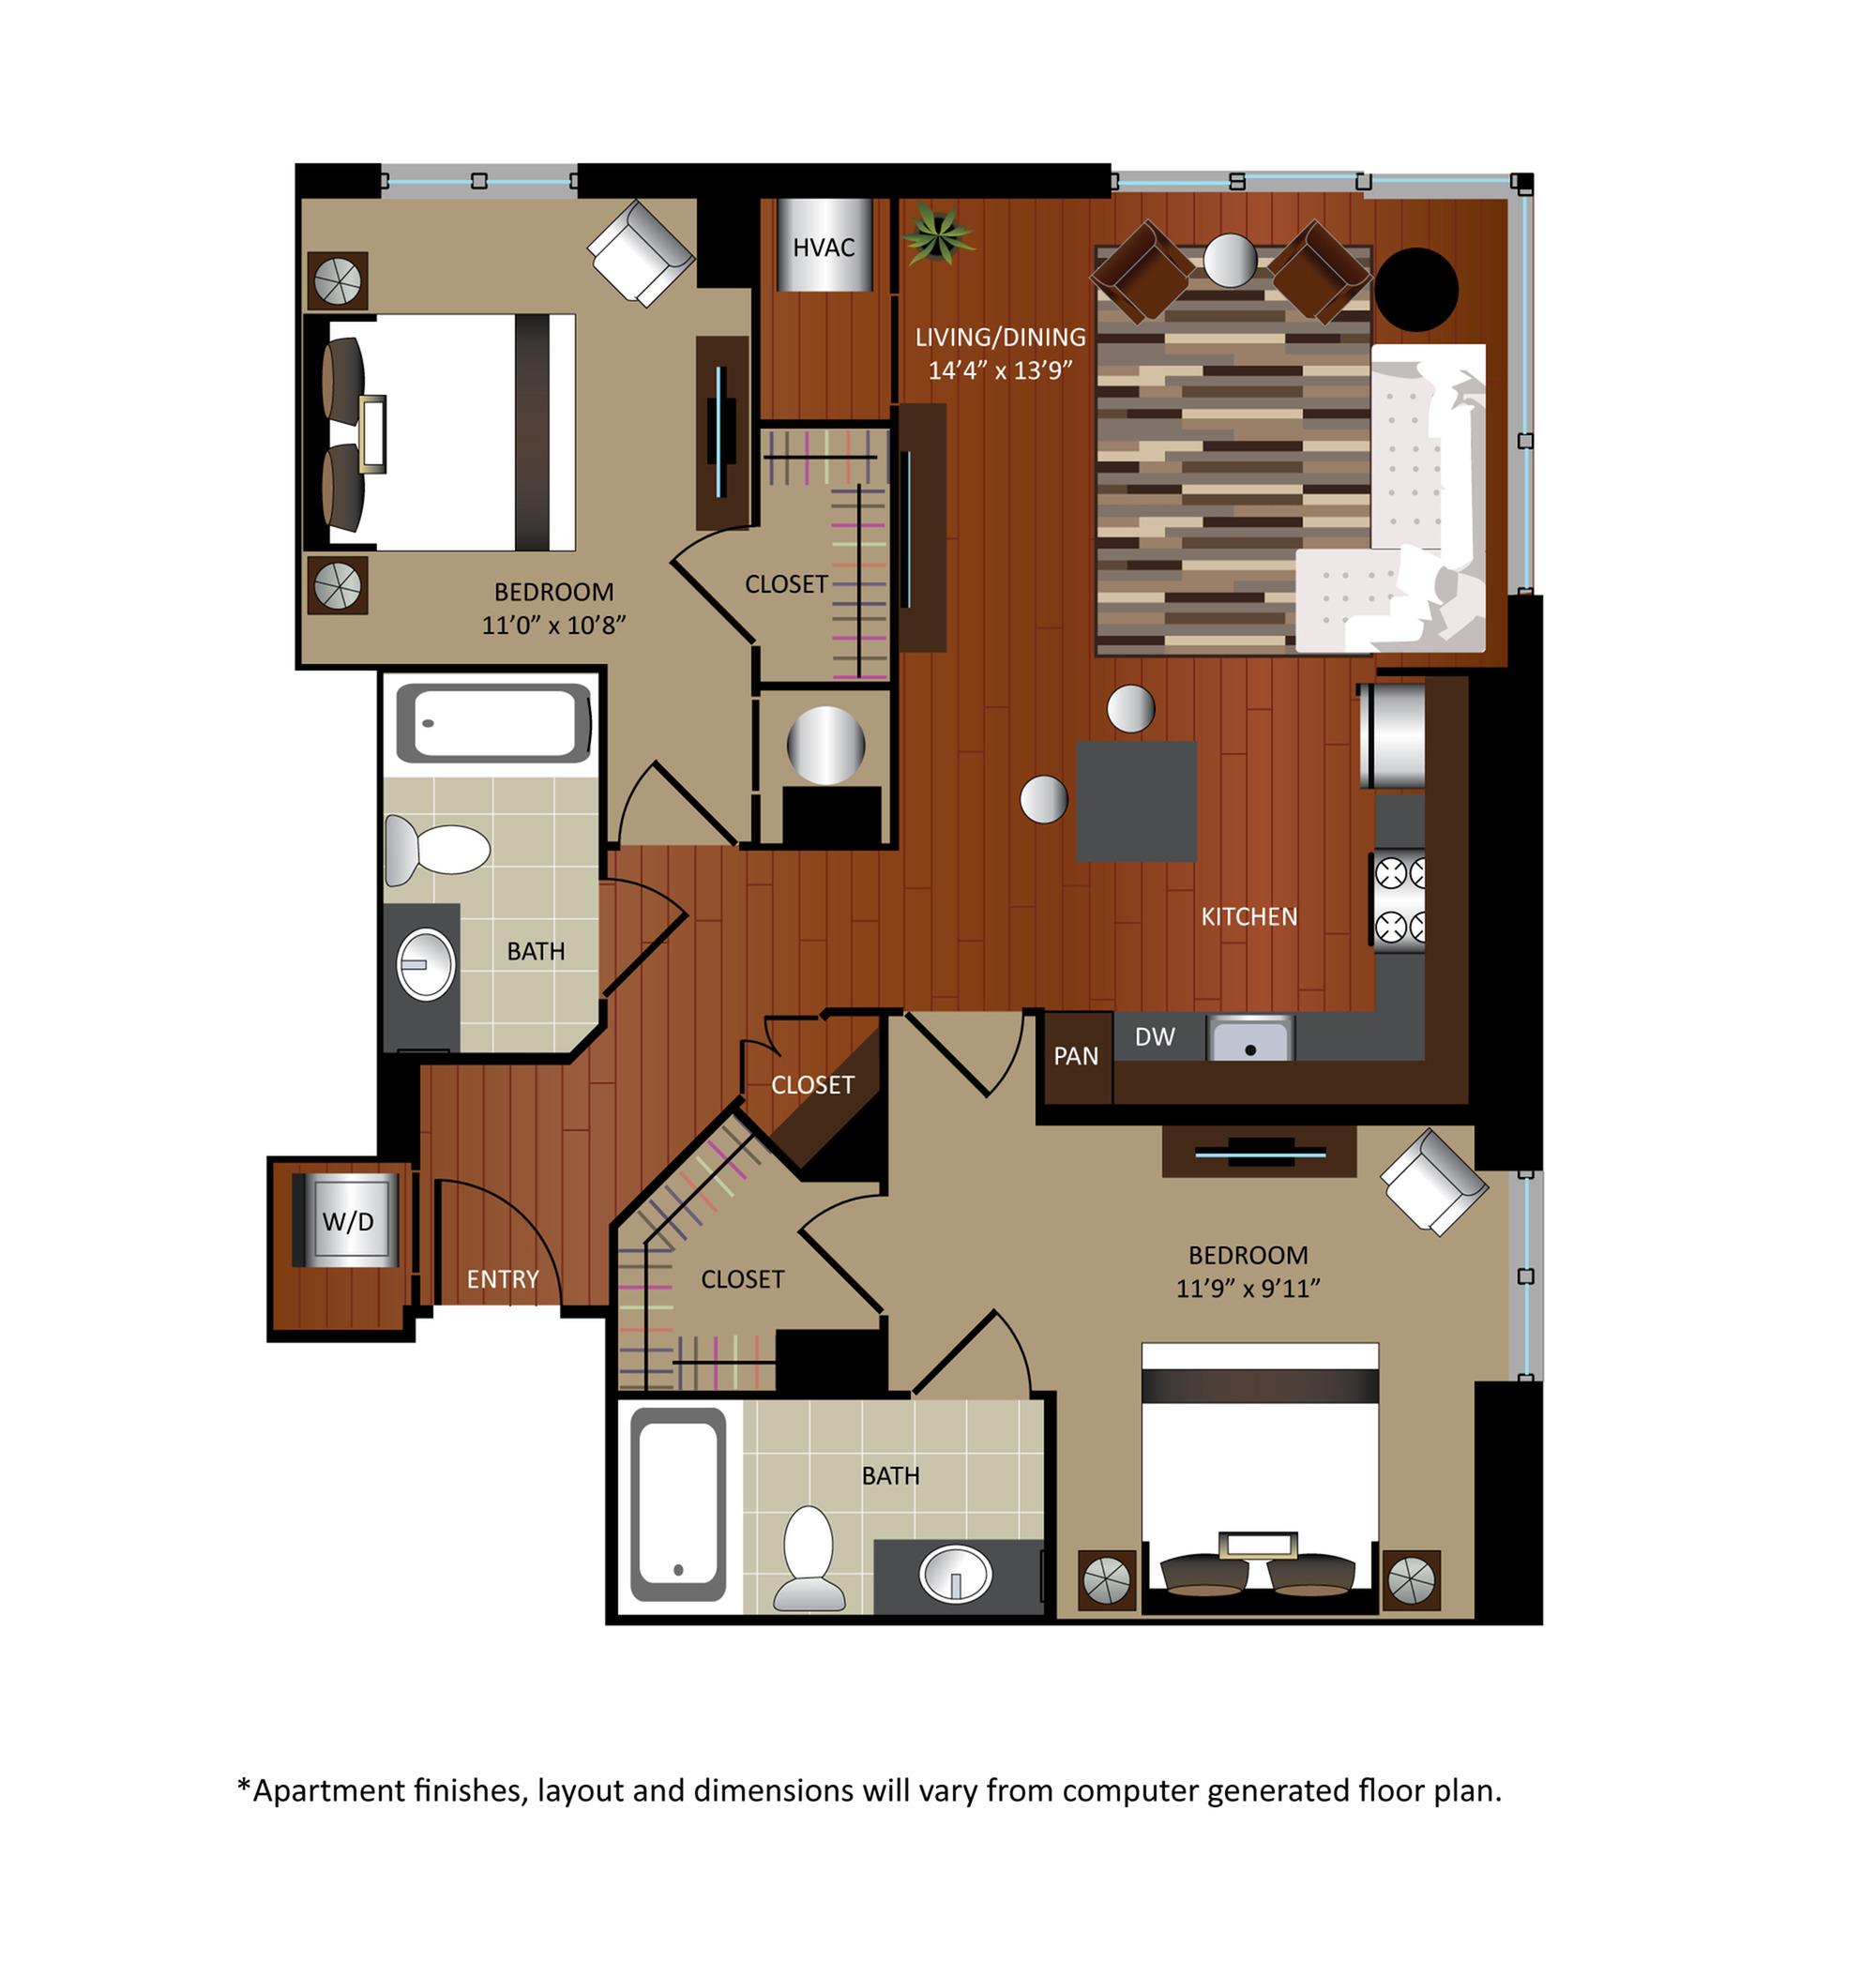 2 Bed / 2 Bath Apartment in Washington DC | Gables City Vista